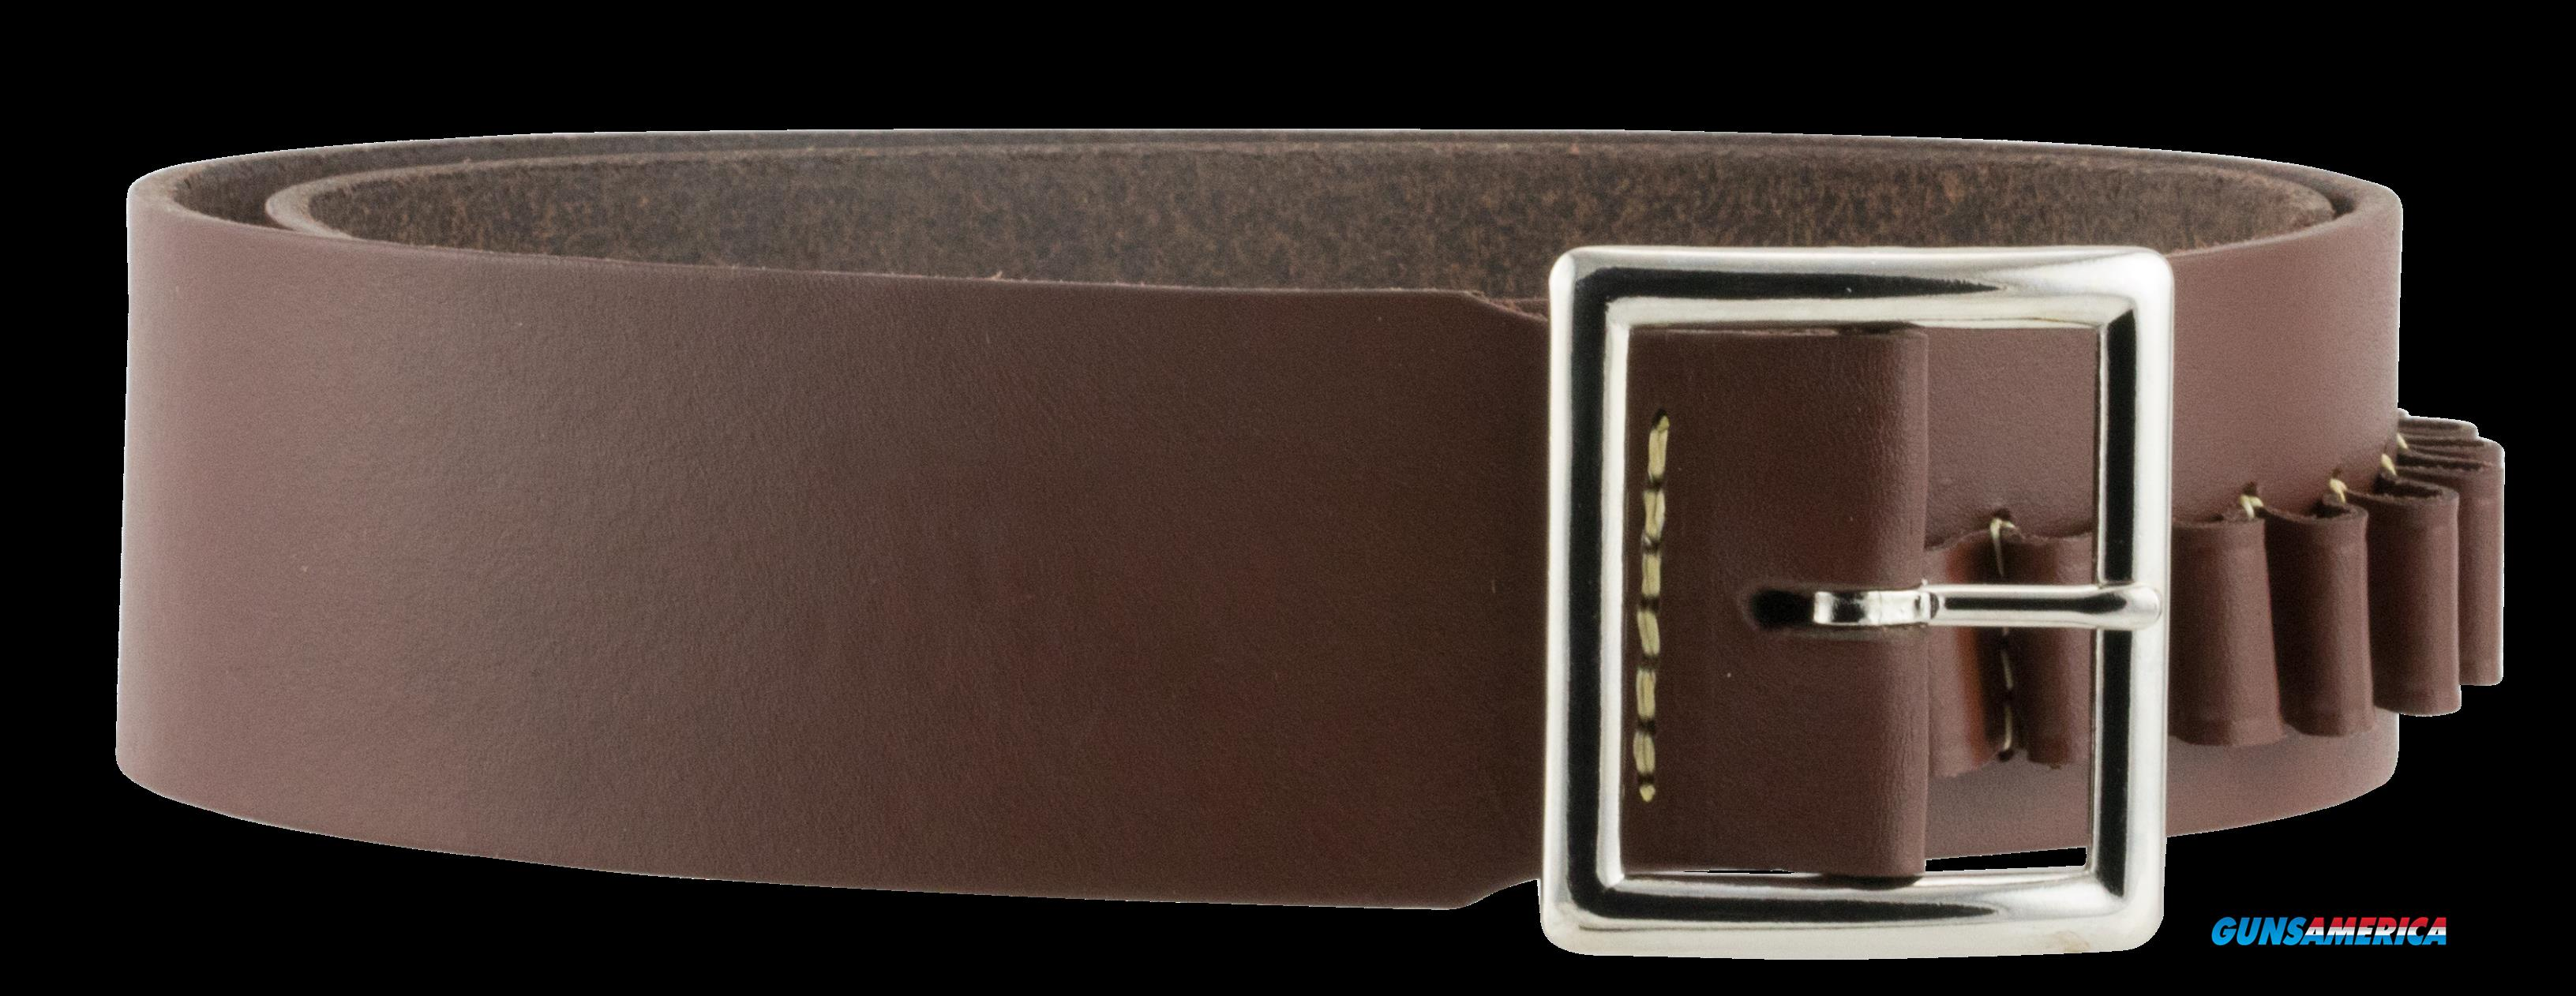 Hunter Company Belt, Hunt 1451l      2in Cart Leather Belt 45c Lrg  Brn  Guns > Pistols > 1911 Pistol Copies (non-Colt)